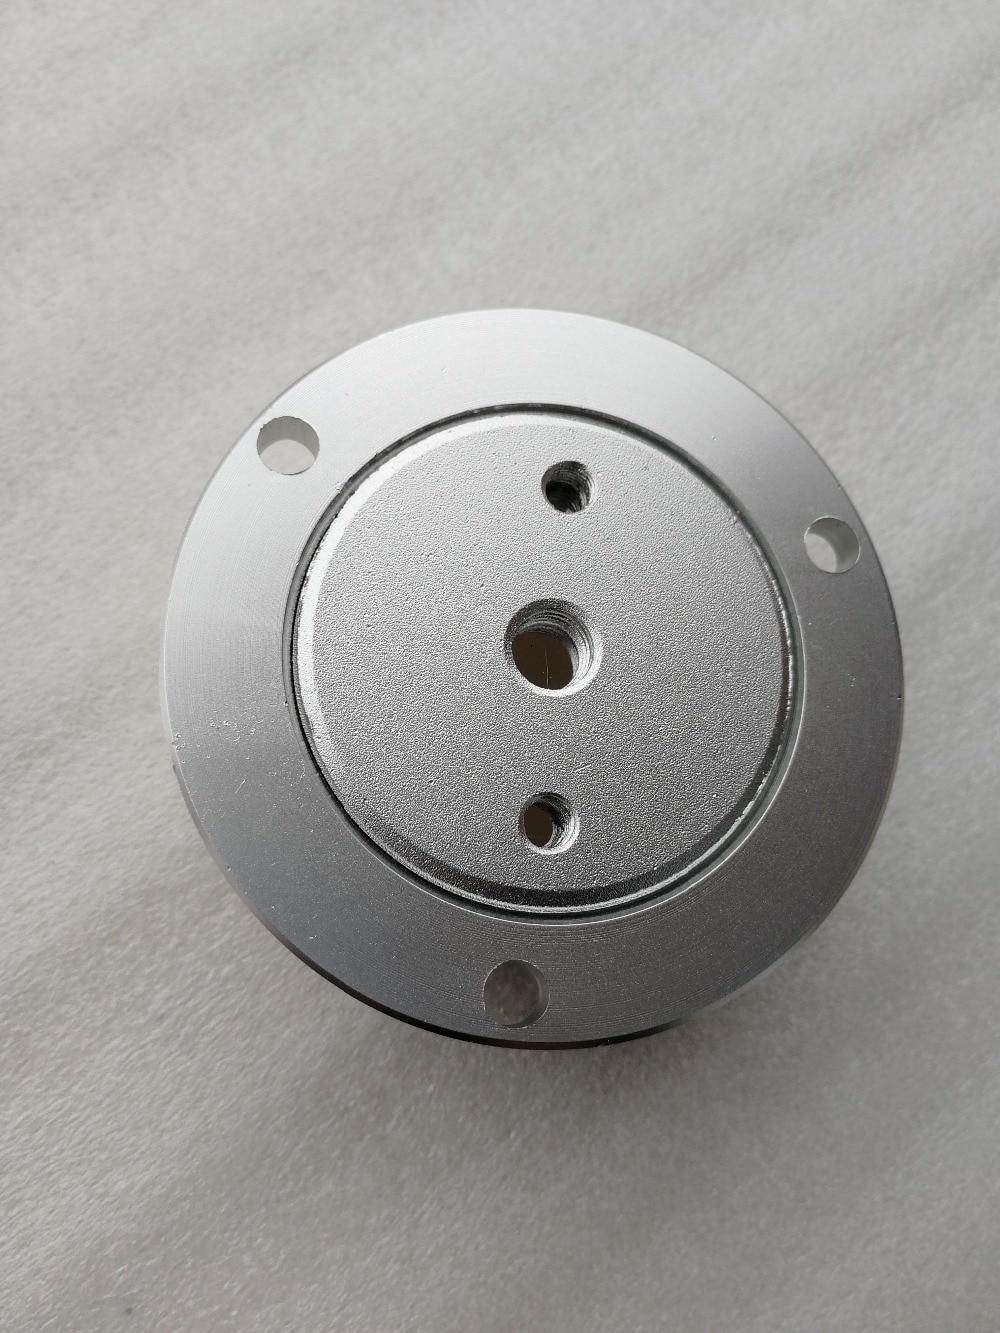 EAS sert etiketi Remover süper manyetik eas alarm etiketi detacher - Güvenlik ve Koruma - Fotoğraf 4